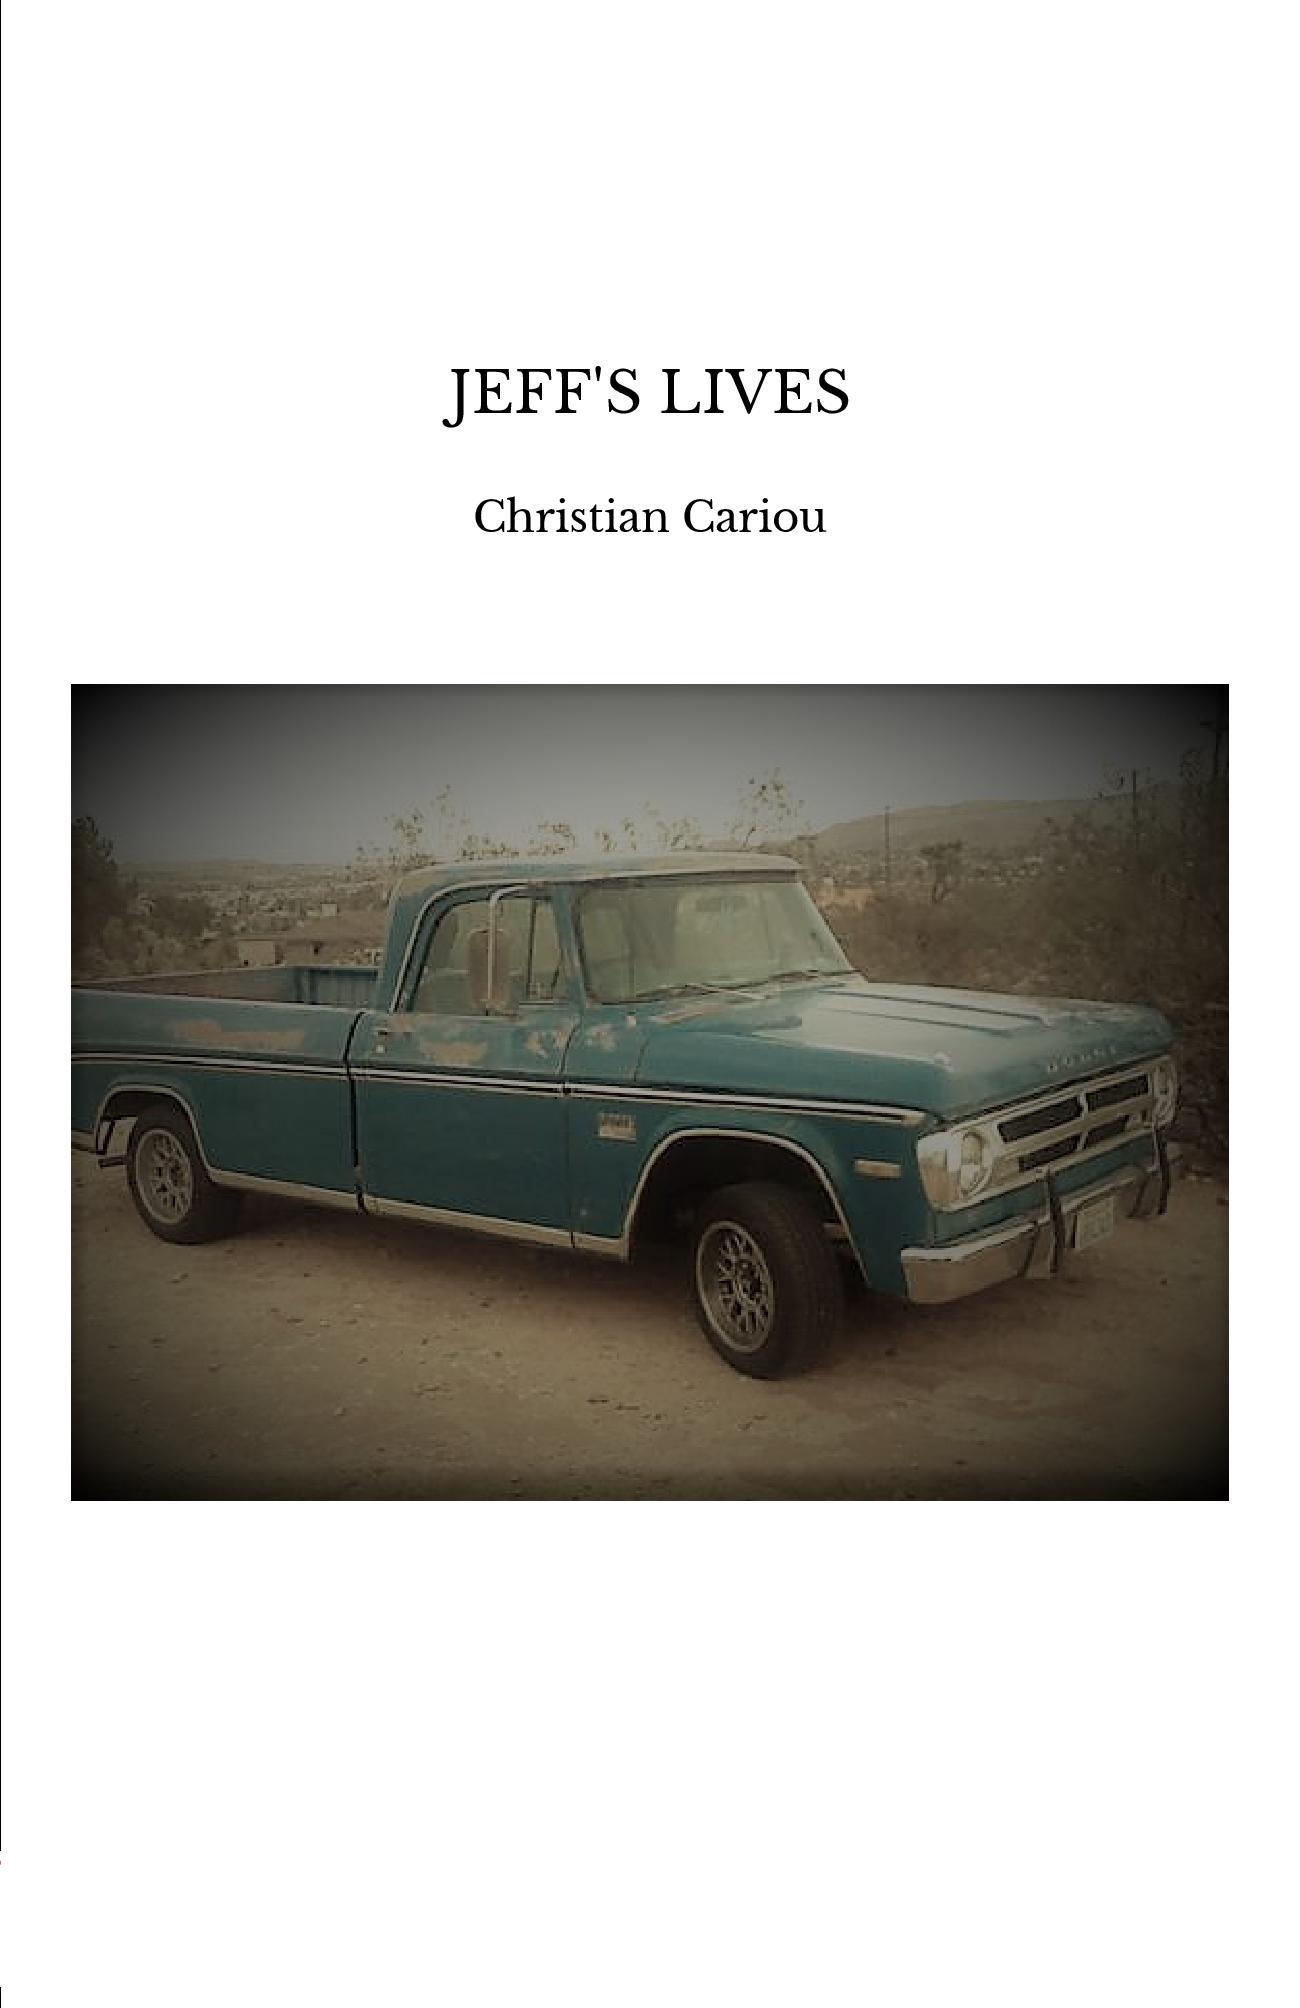 JEFF'S LIVES